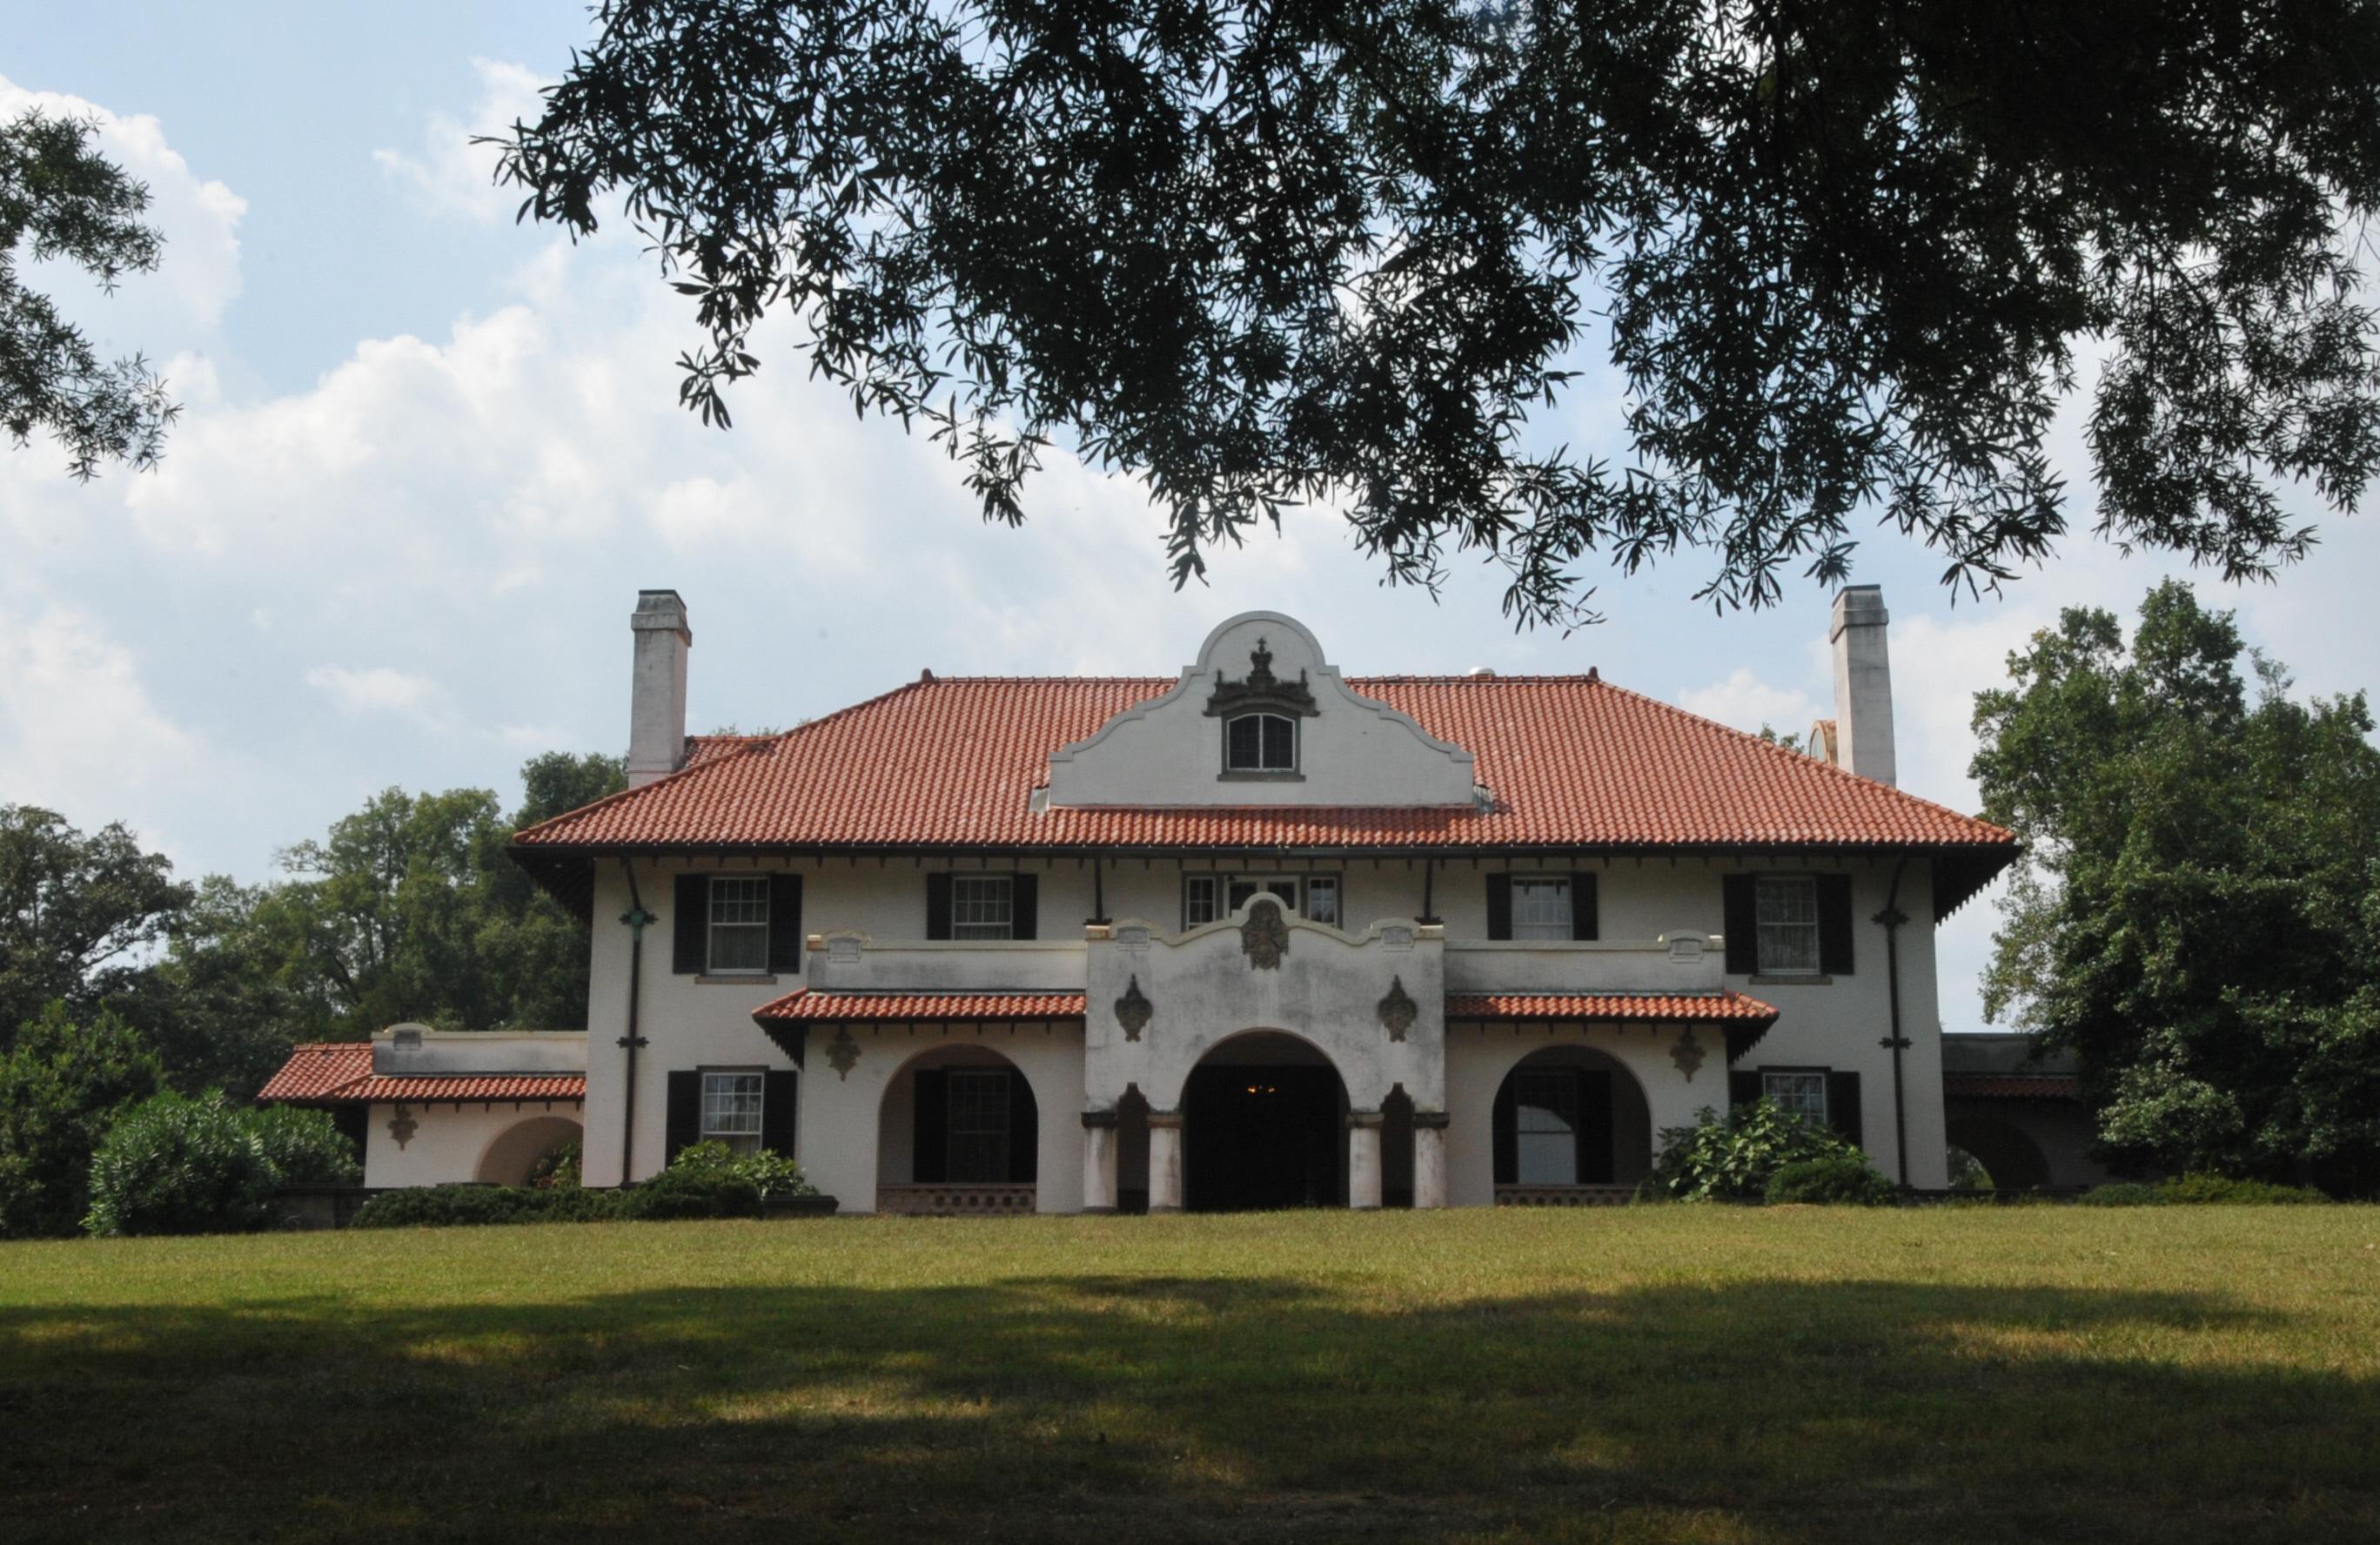 File:JOHN SPRUNT HILL HOUSE, DURHAM COUNTY.JPG - Wikipedia, thebalance of durham county